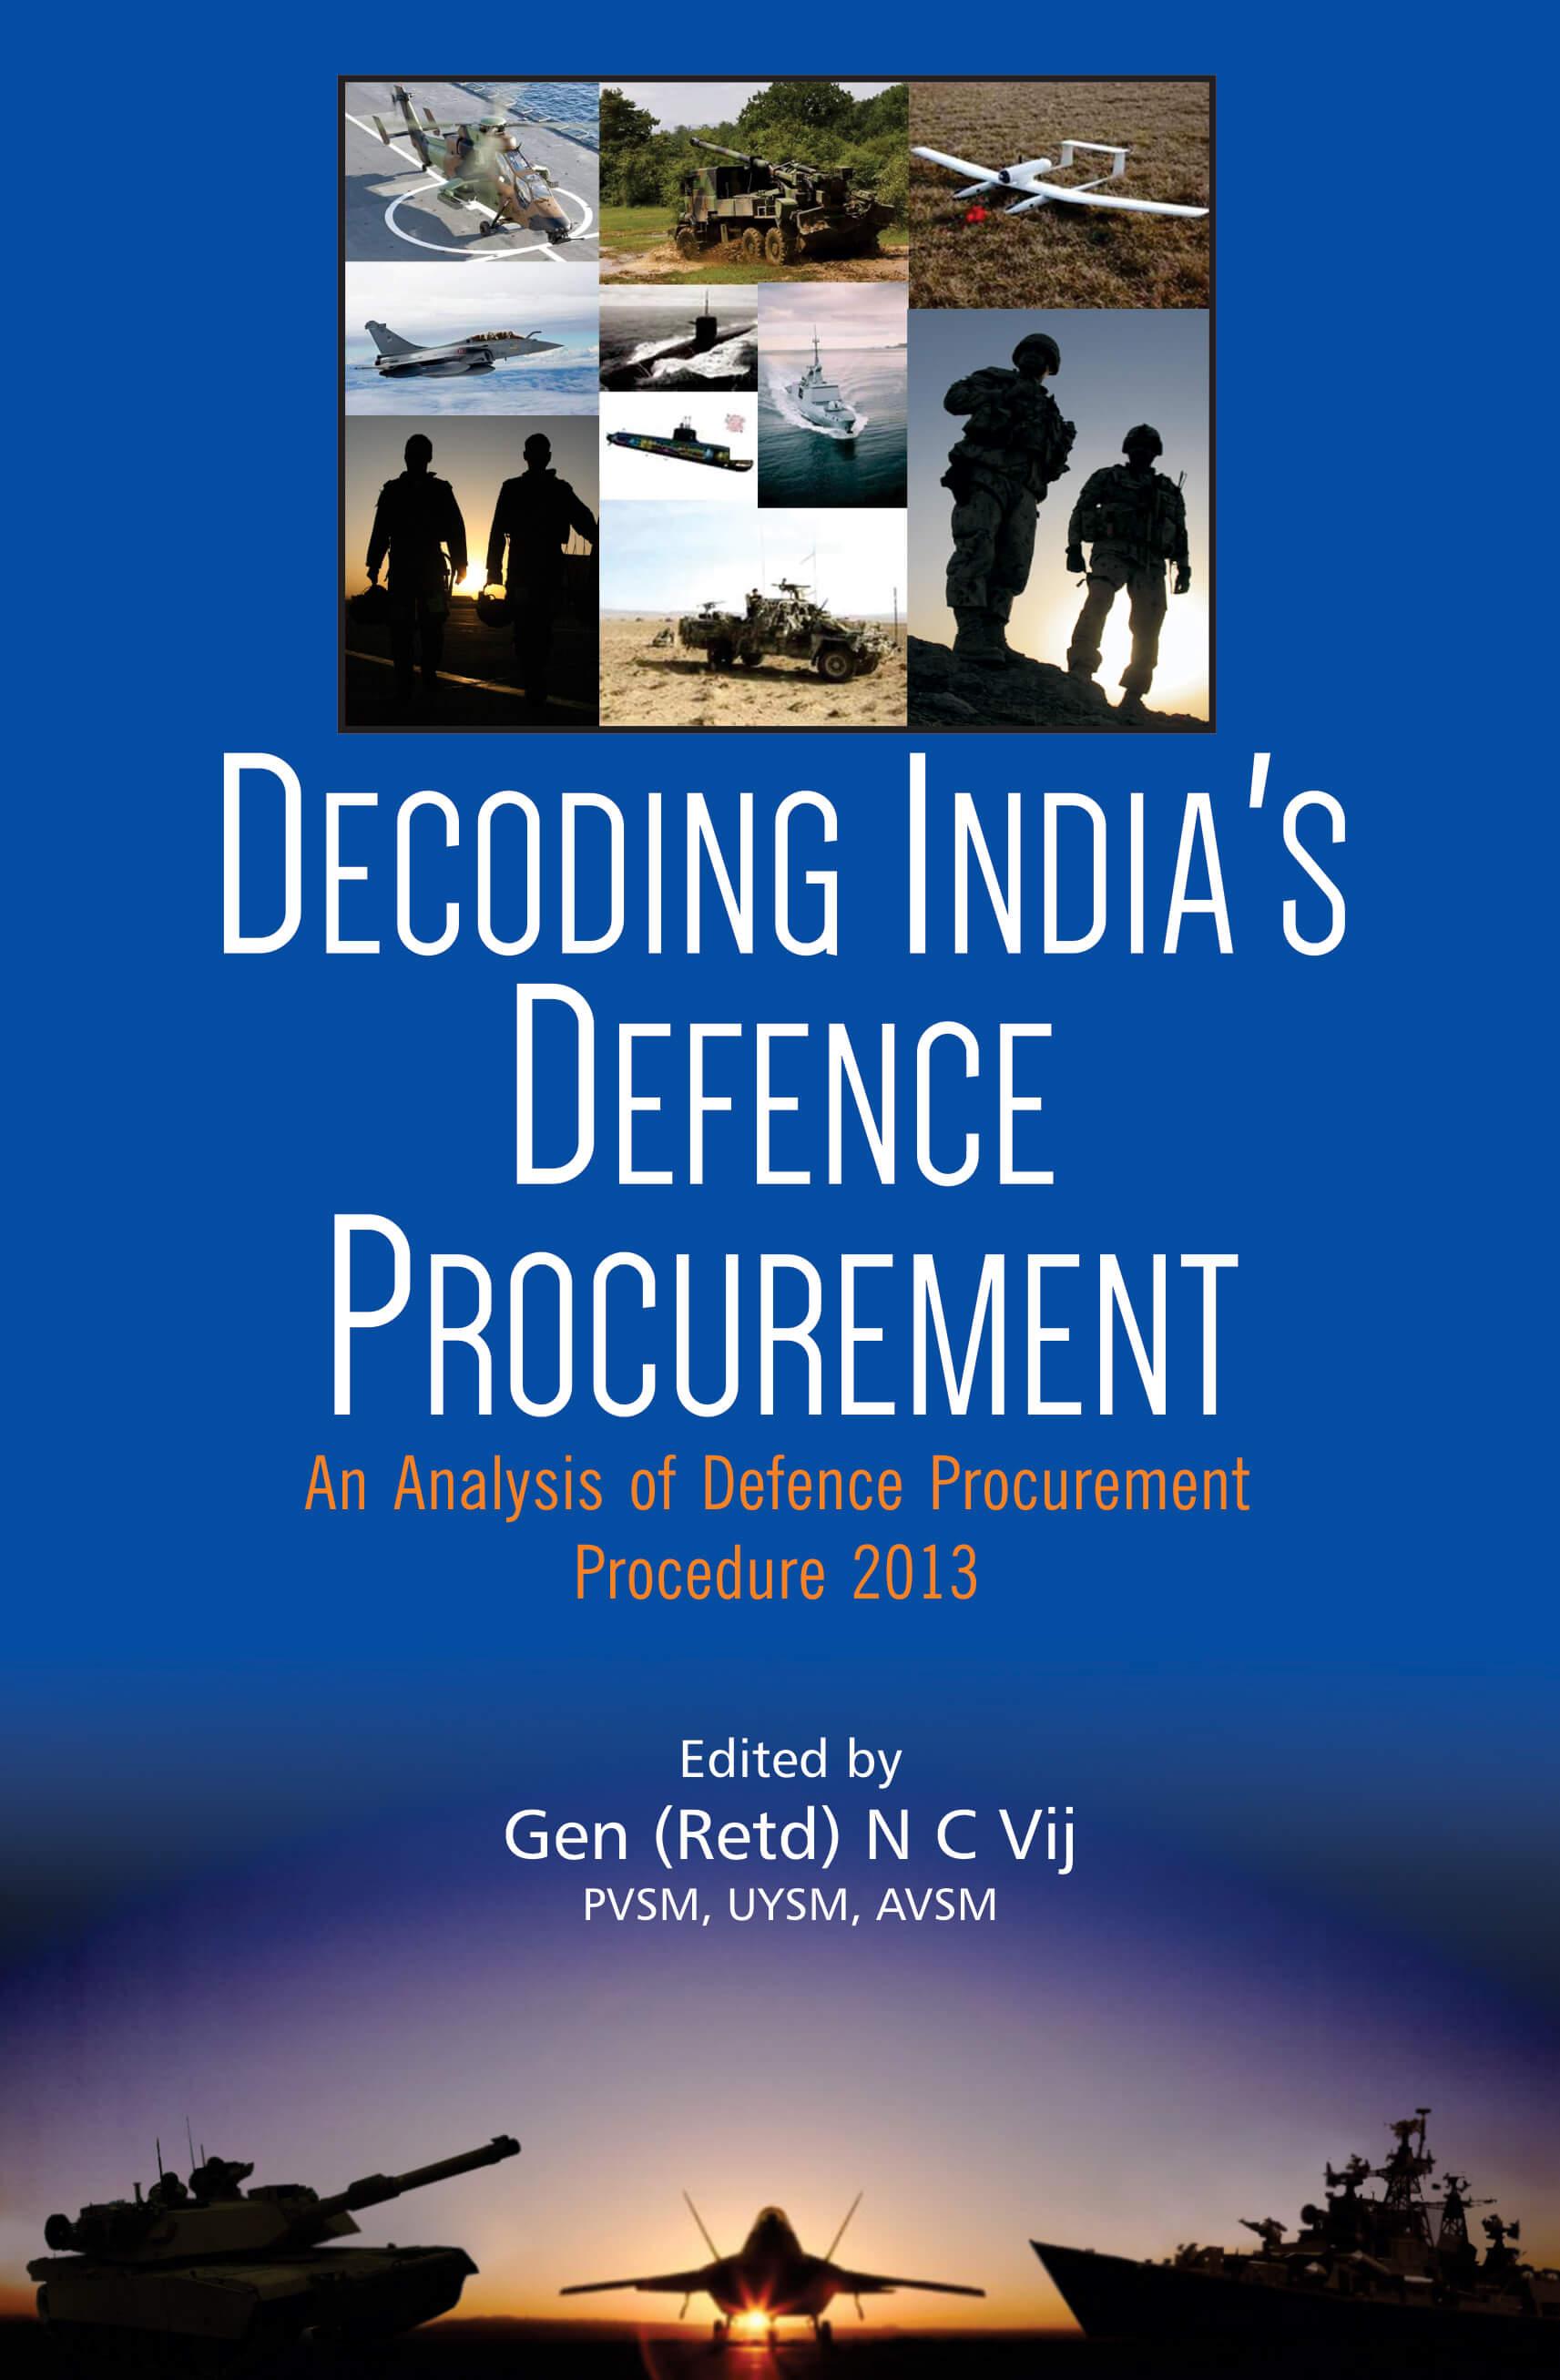 Decoding India'S Defence Procurement: An Analysis Of Defence Procurement Procedure 2013